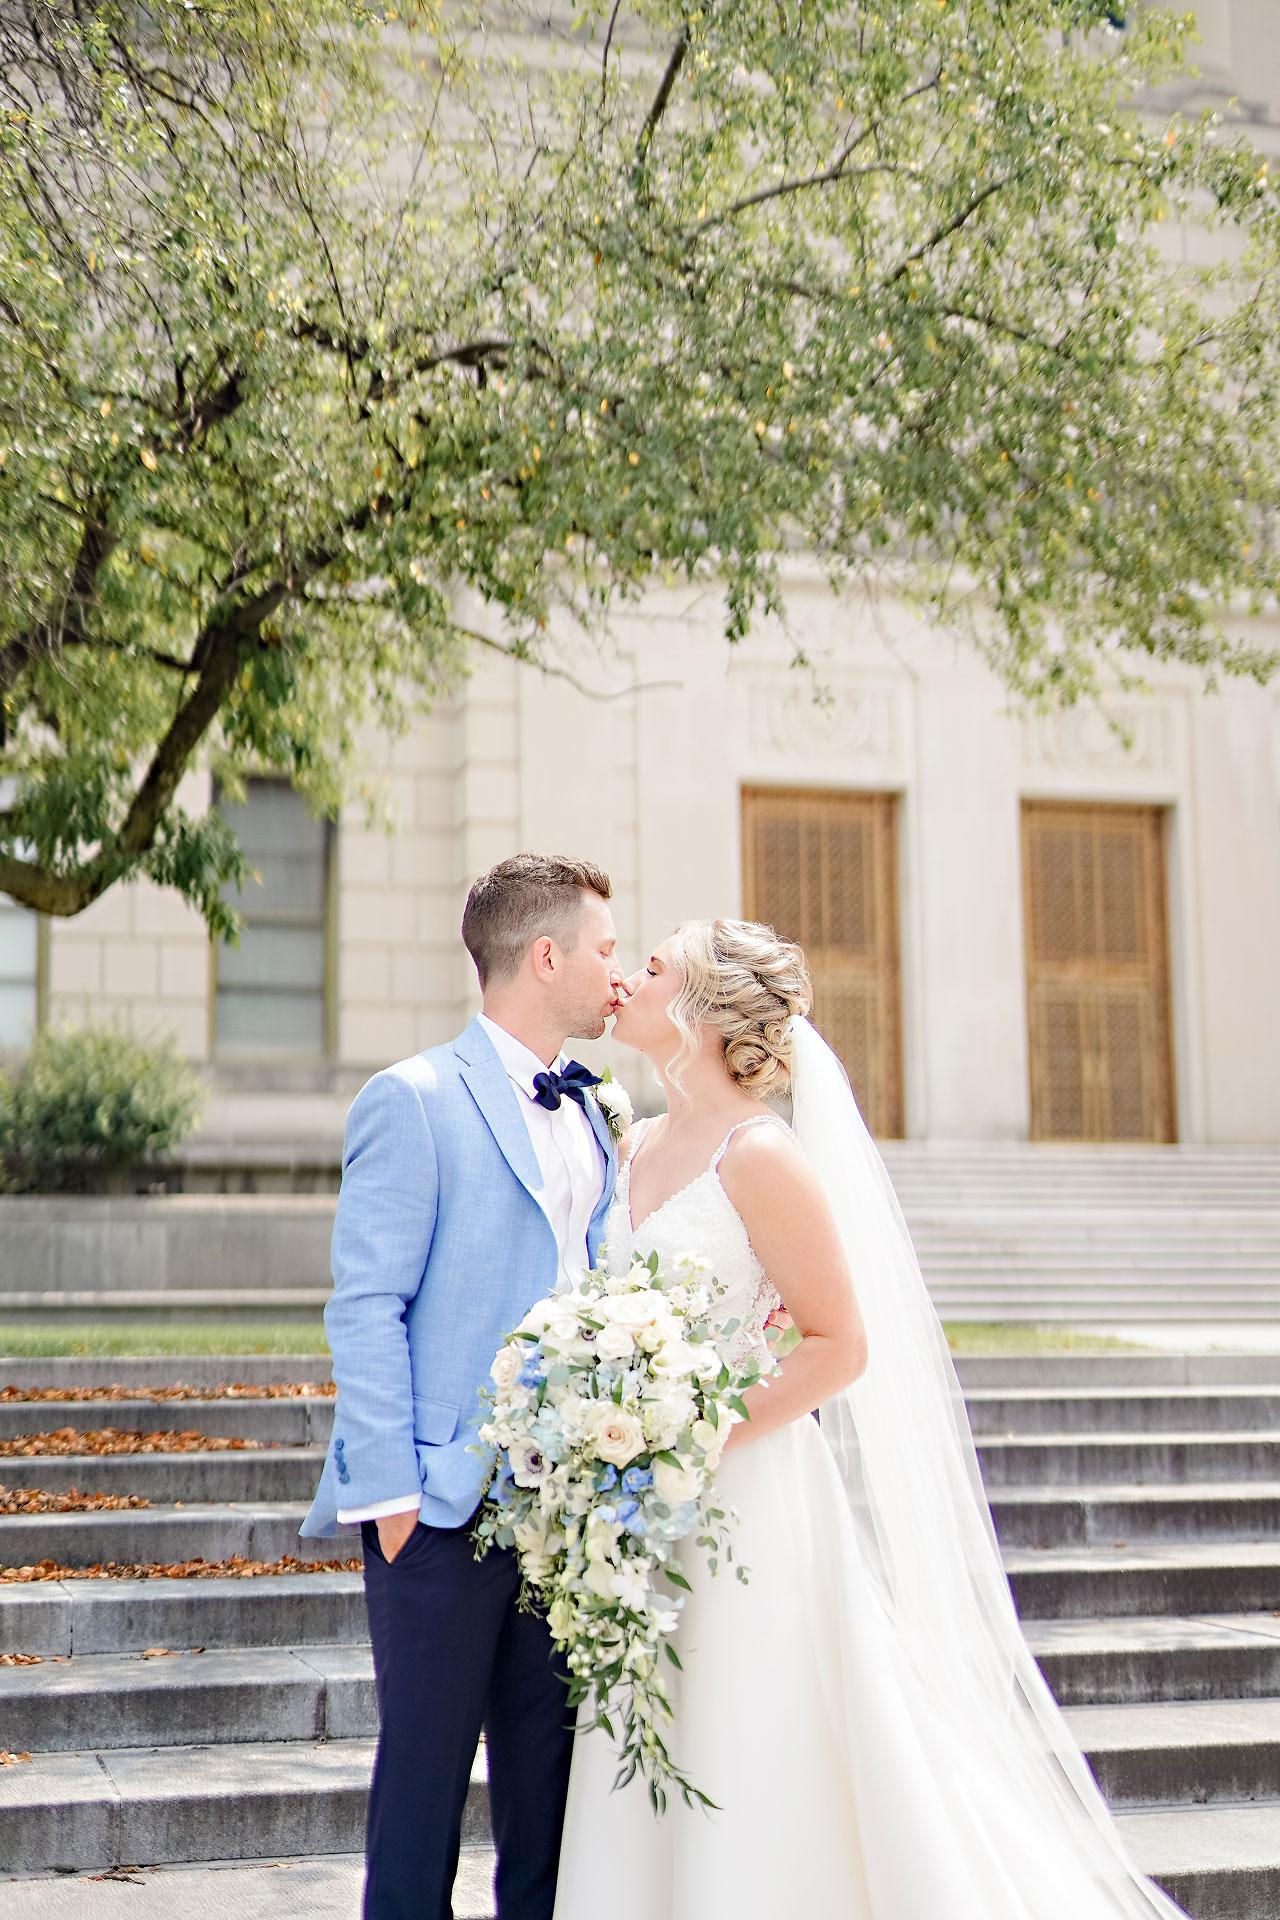 Sammi Jack Regions Tower JPS Events Indianapolis Wedding 094